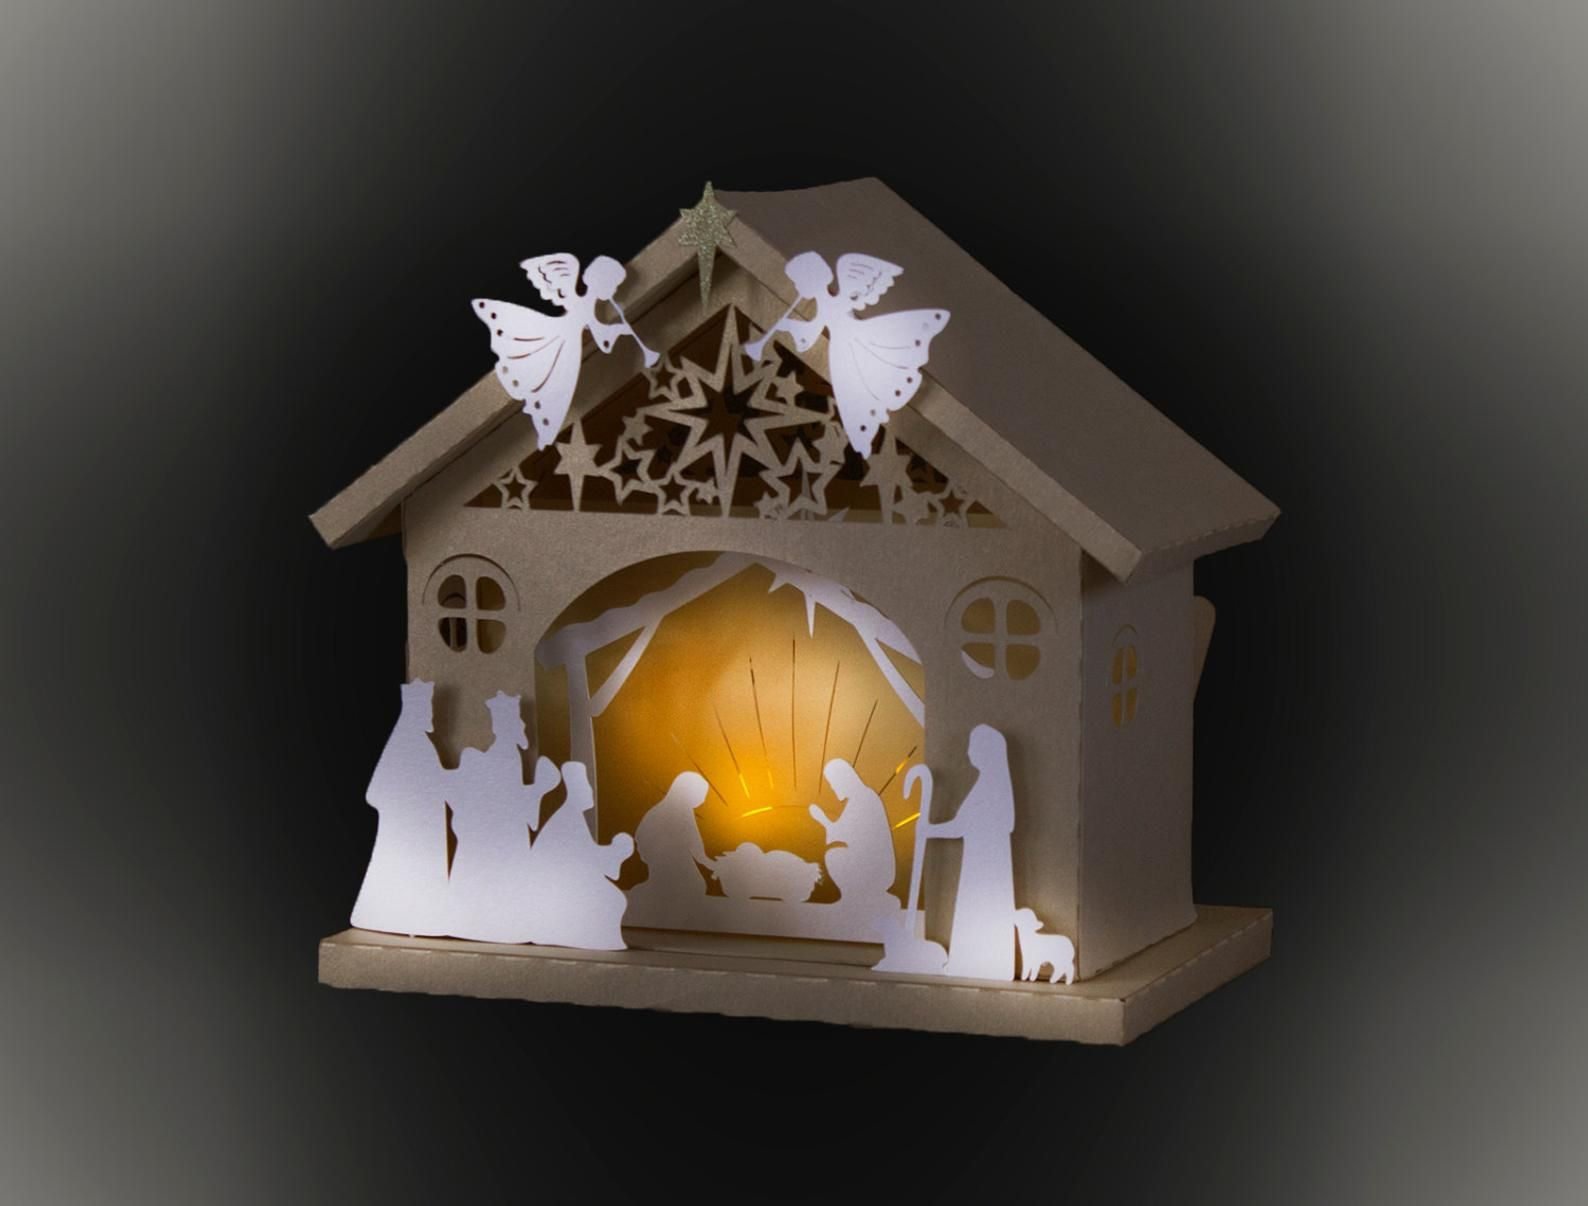 3d Nativity Barn Template In